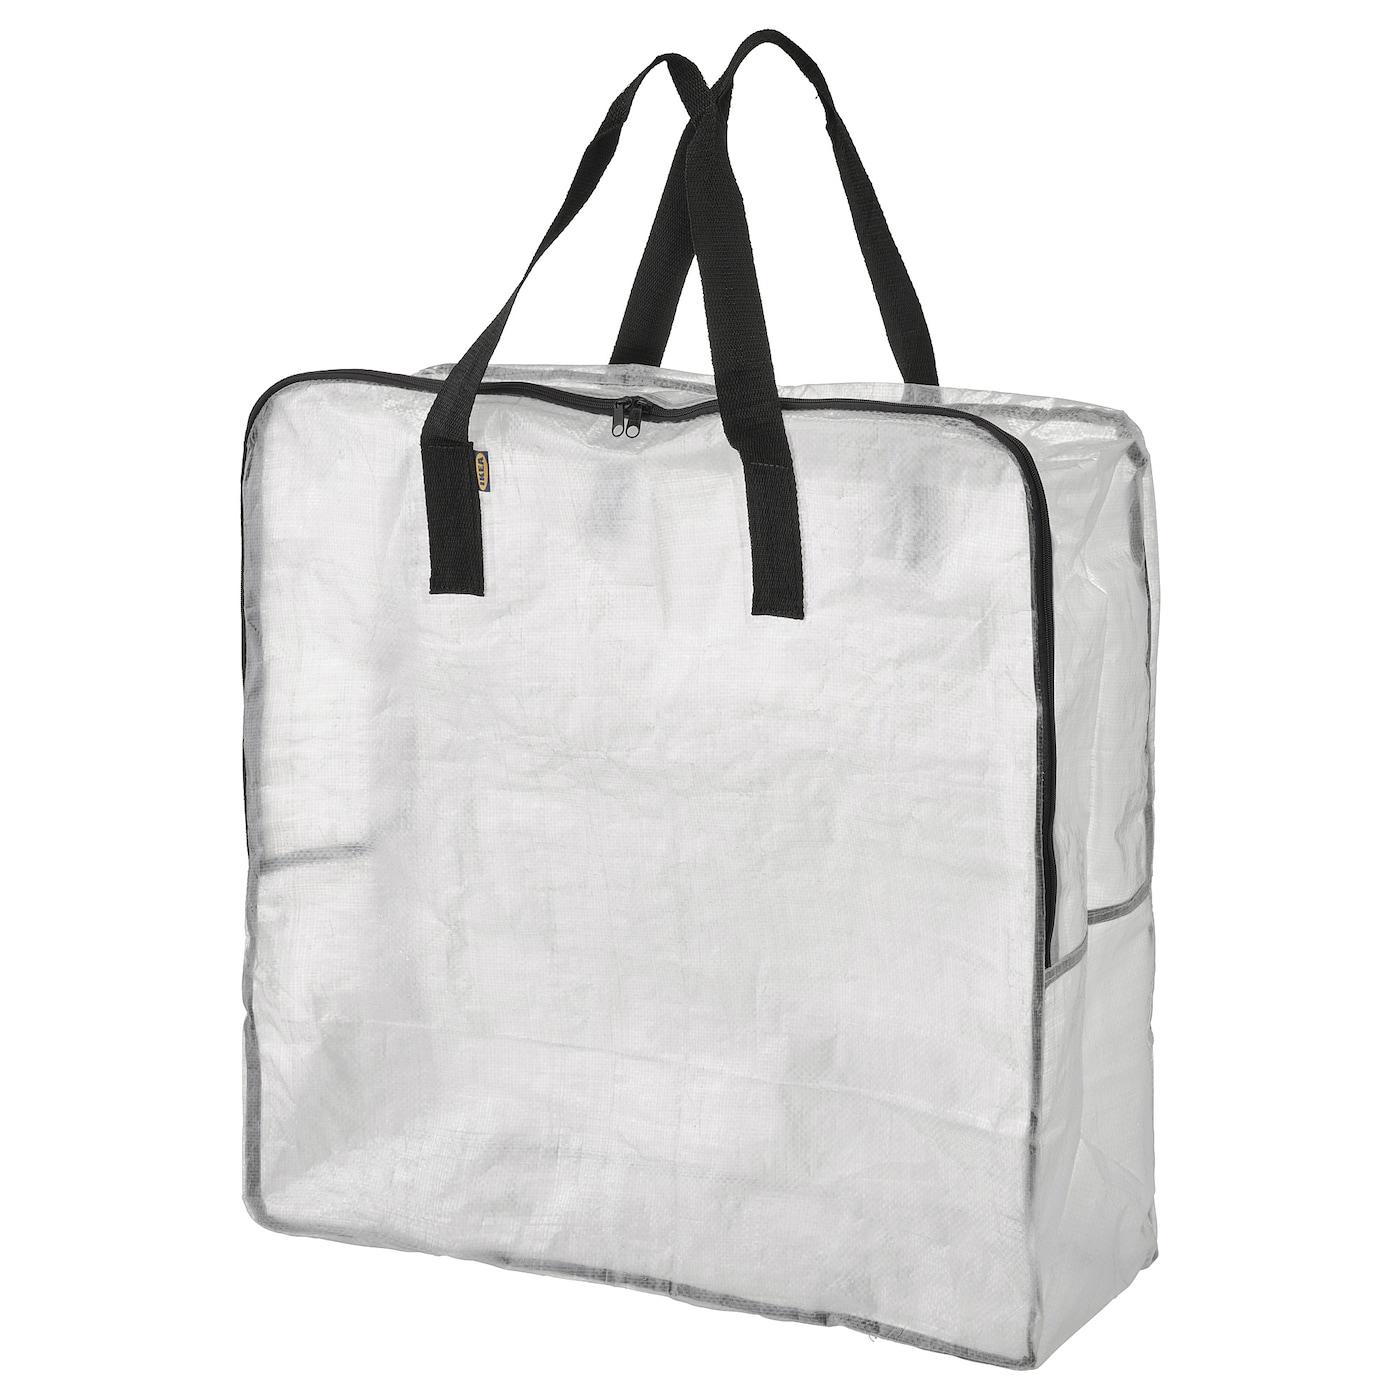 Dimpa Storage Bag Transpa